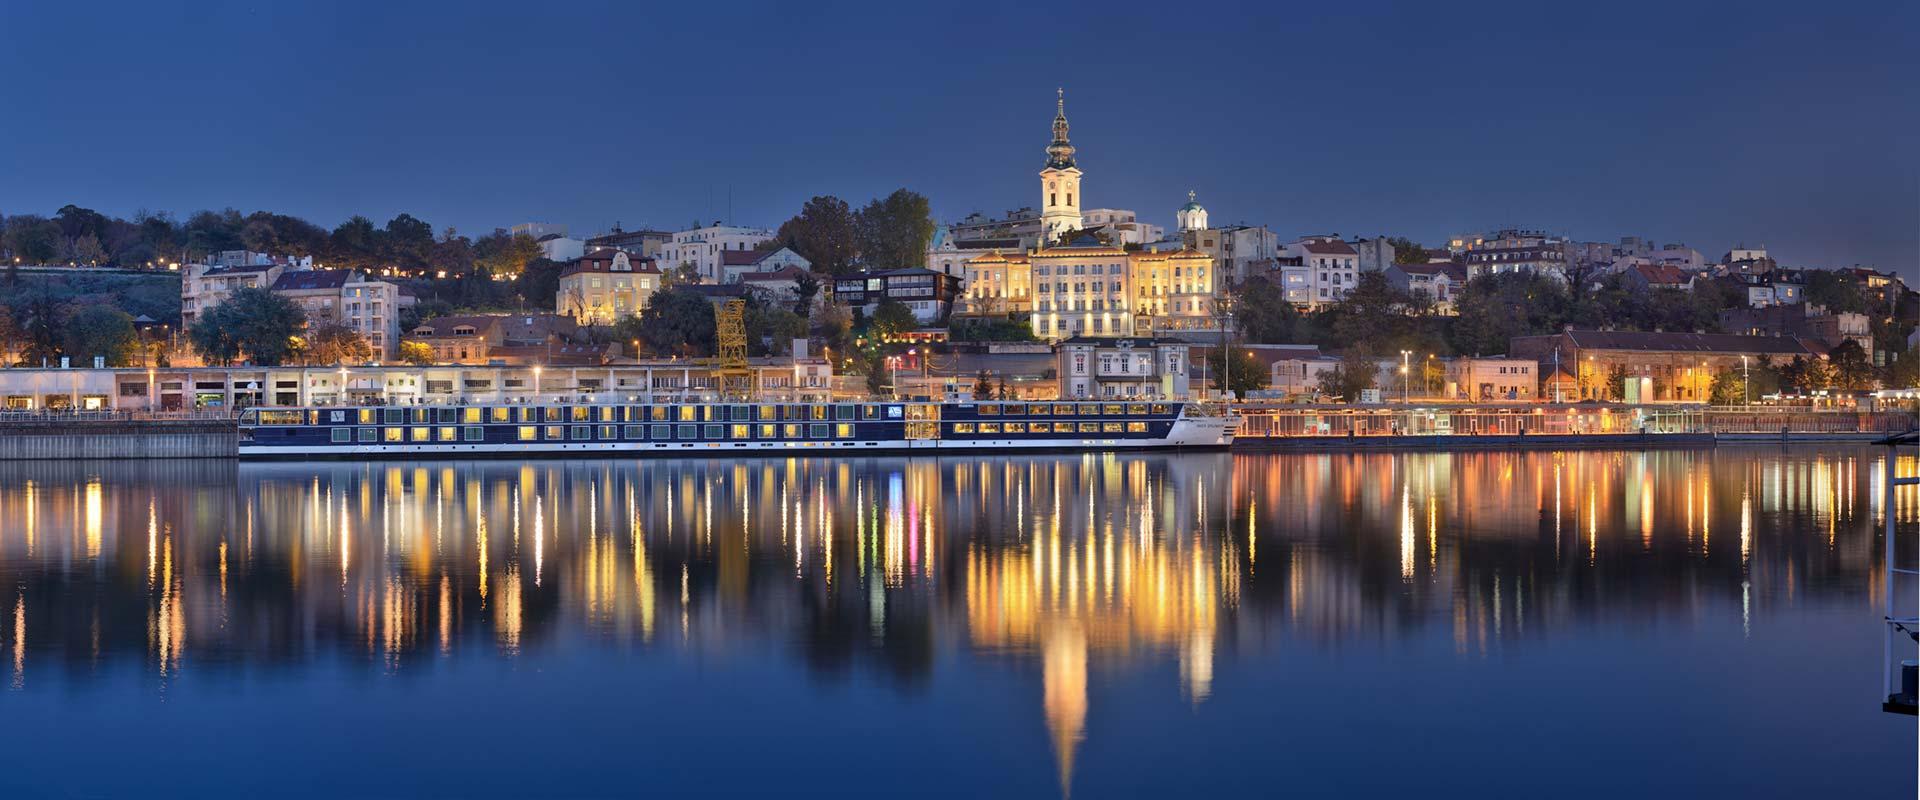 Pogled sa reke, foto Dragan Obrić